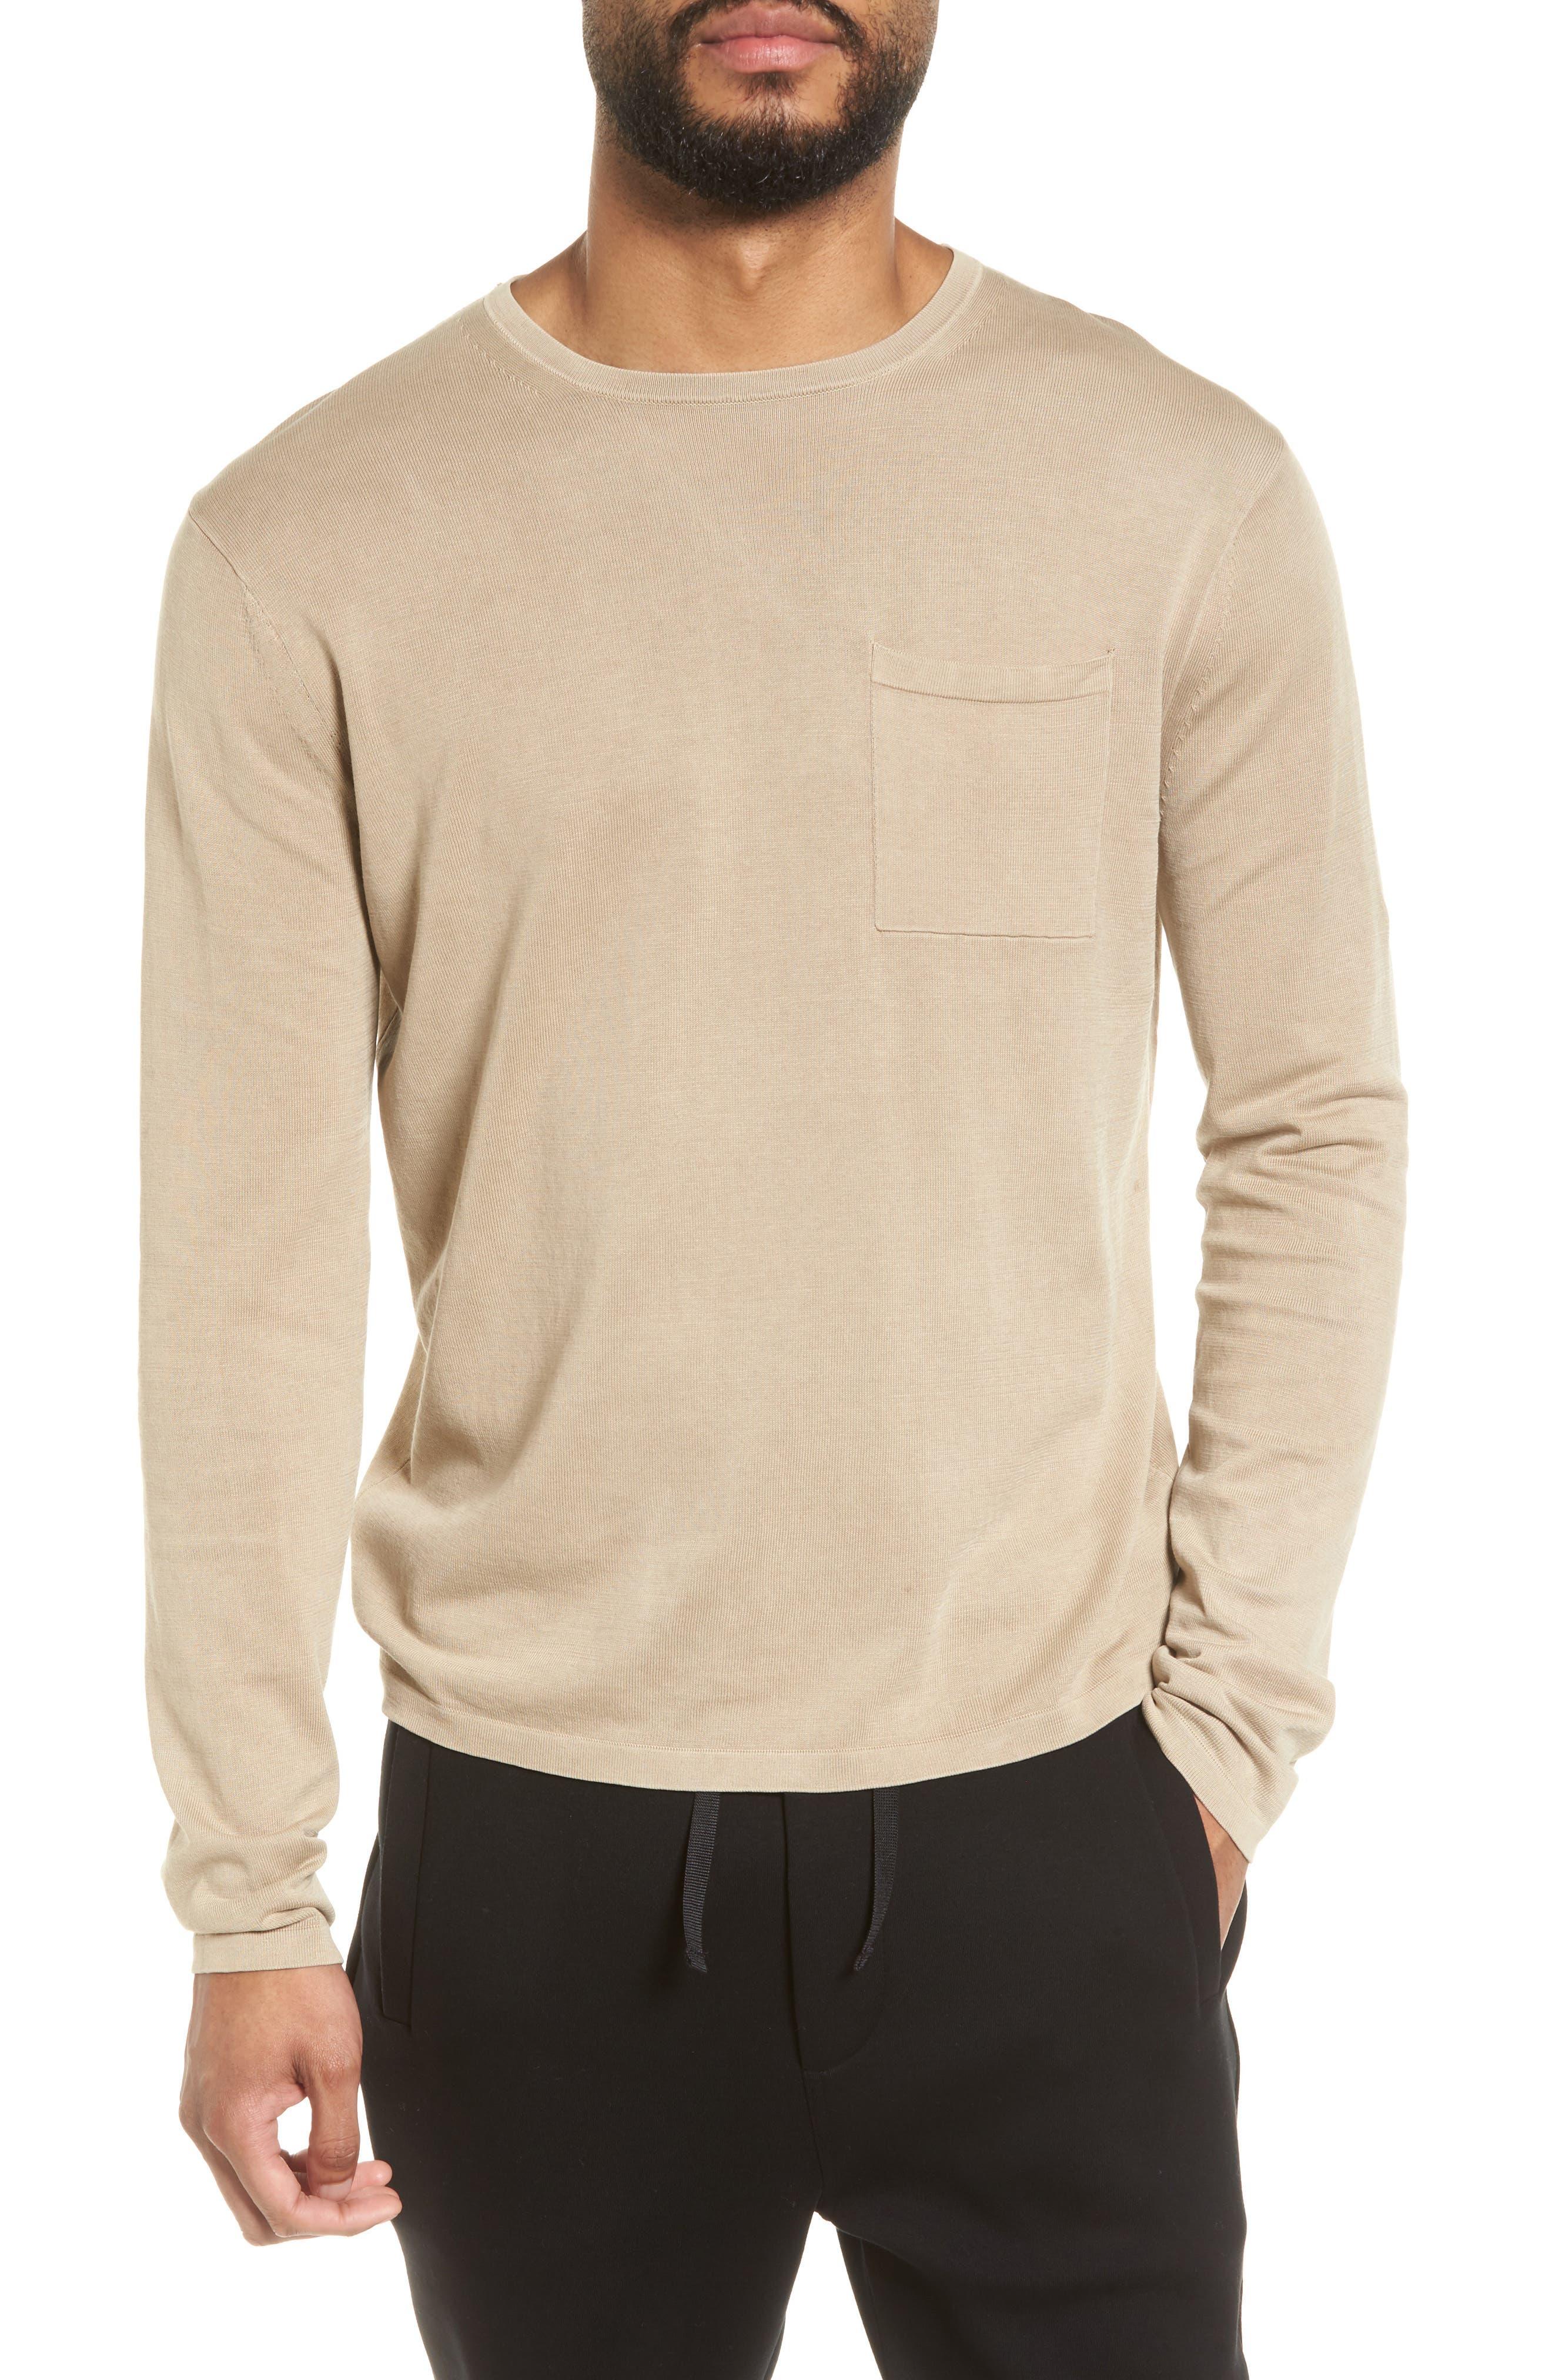 Vince Long Sleeve Pocket T-Shirt